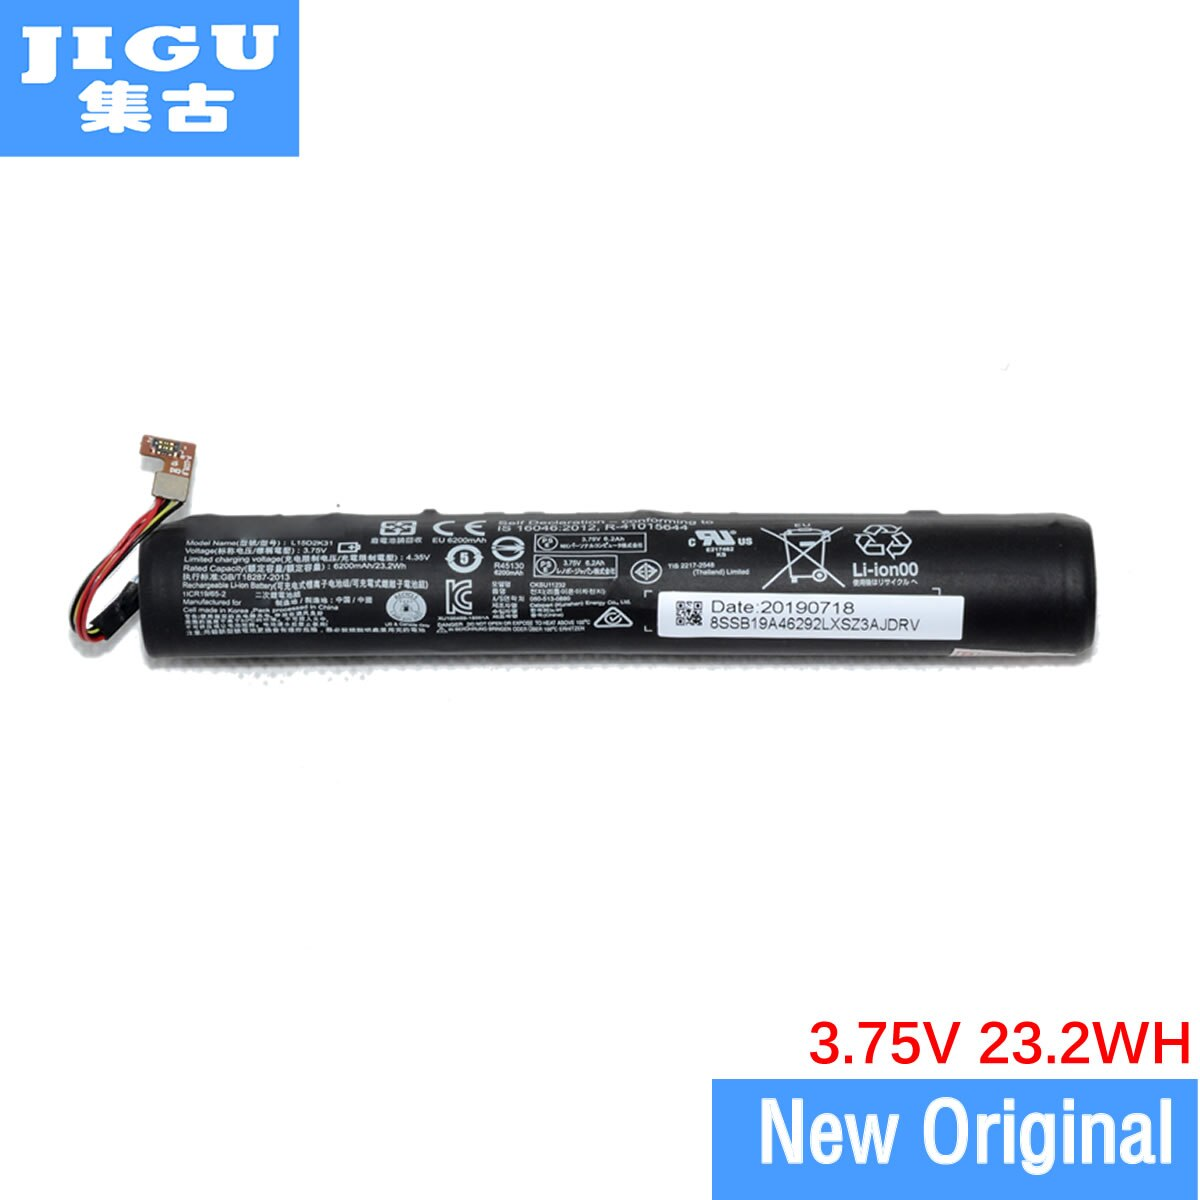 Jigu alta qualidade 6200 mah l15d2k31 l15c2k31 bateria para lenovo yoga 3 Tablet-850M YT3-850 3.75 v 23.2wh